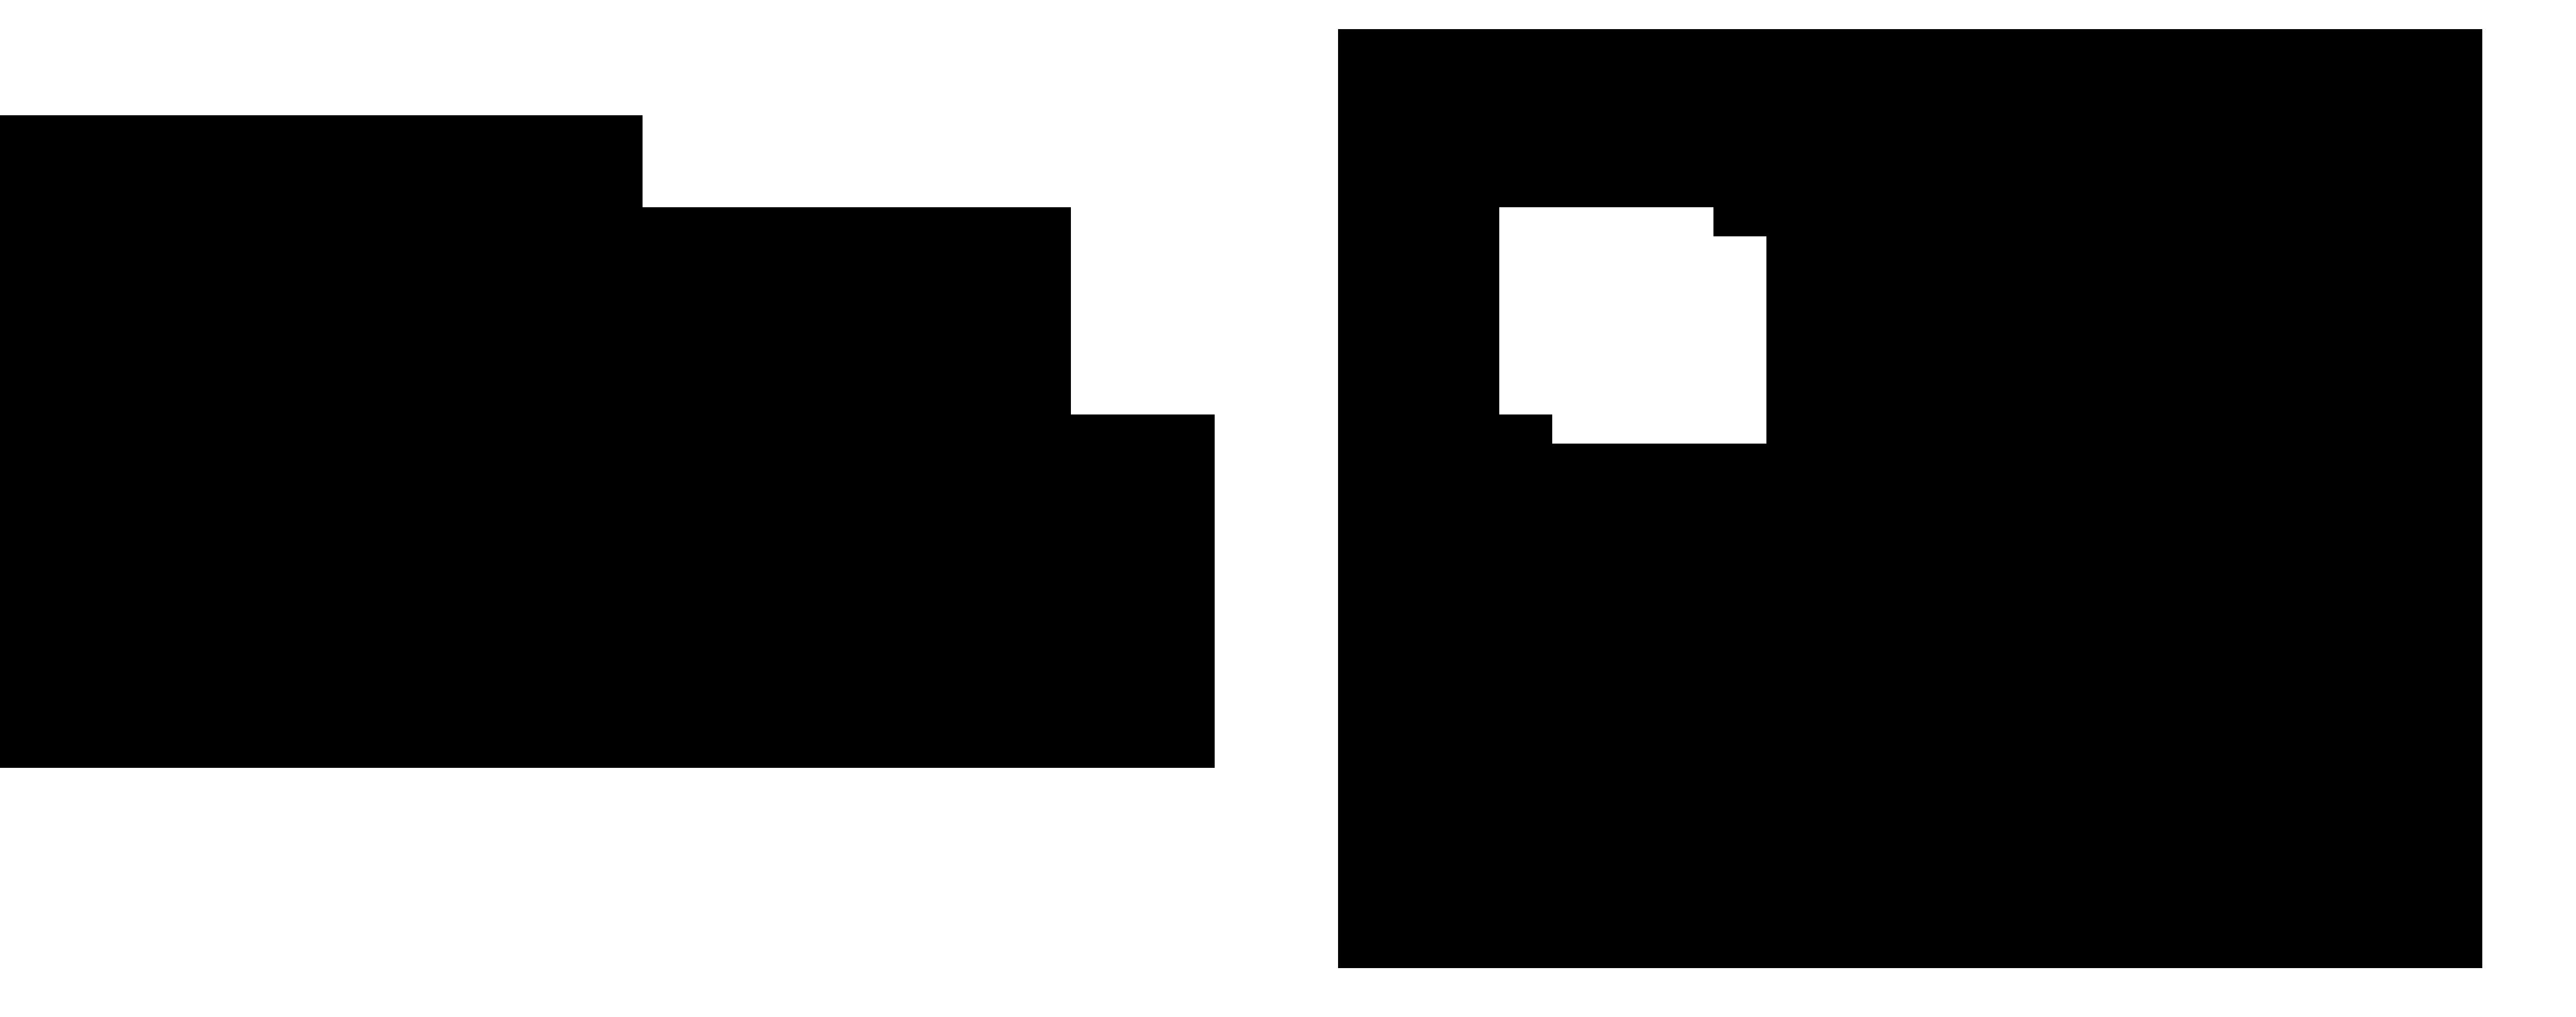 AVA400M_1